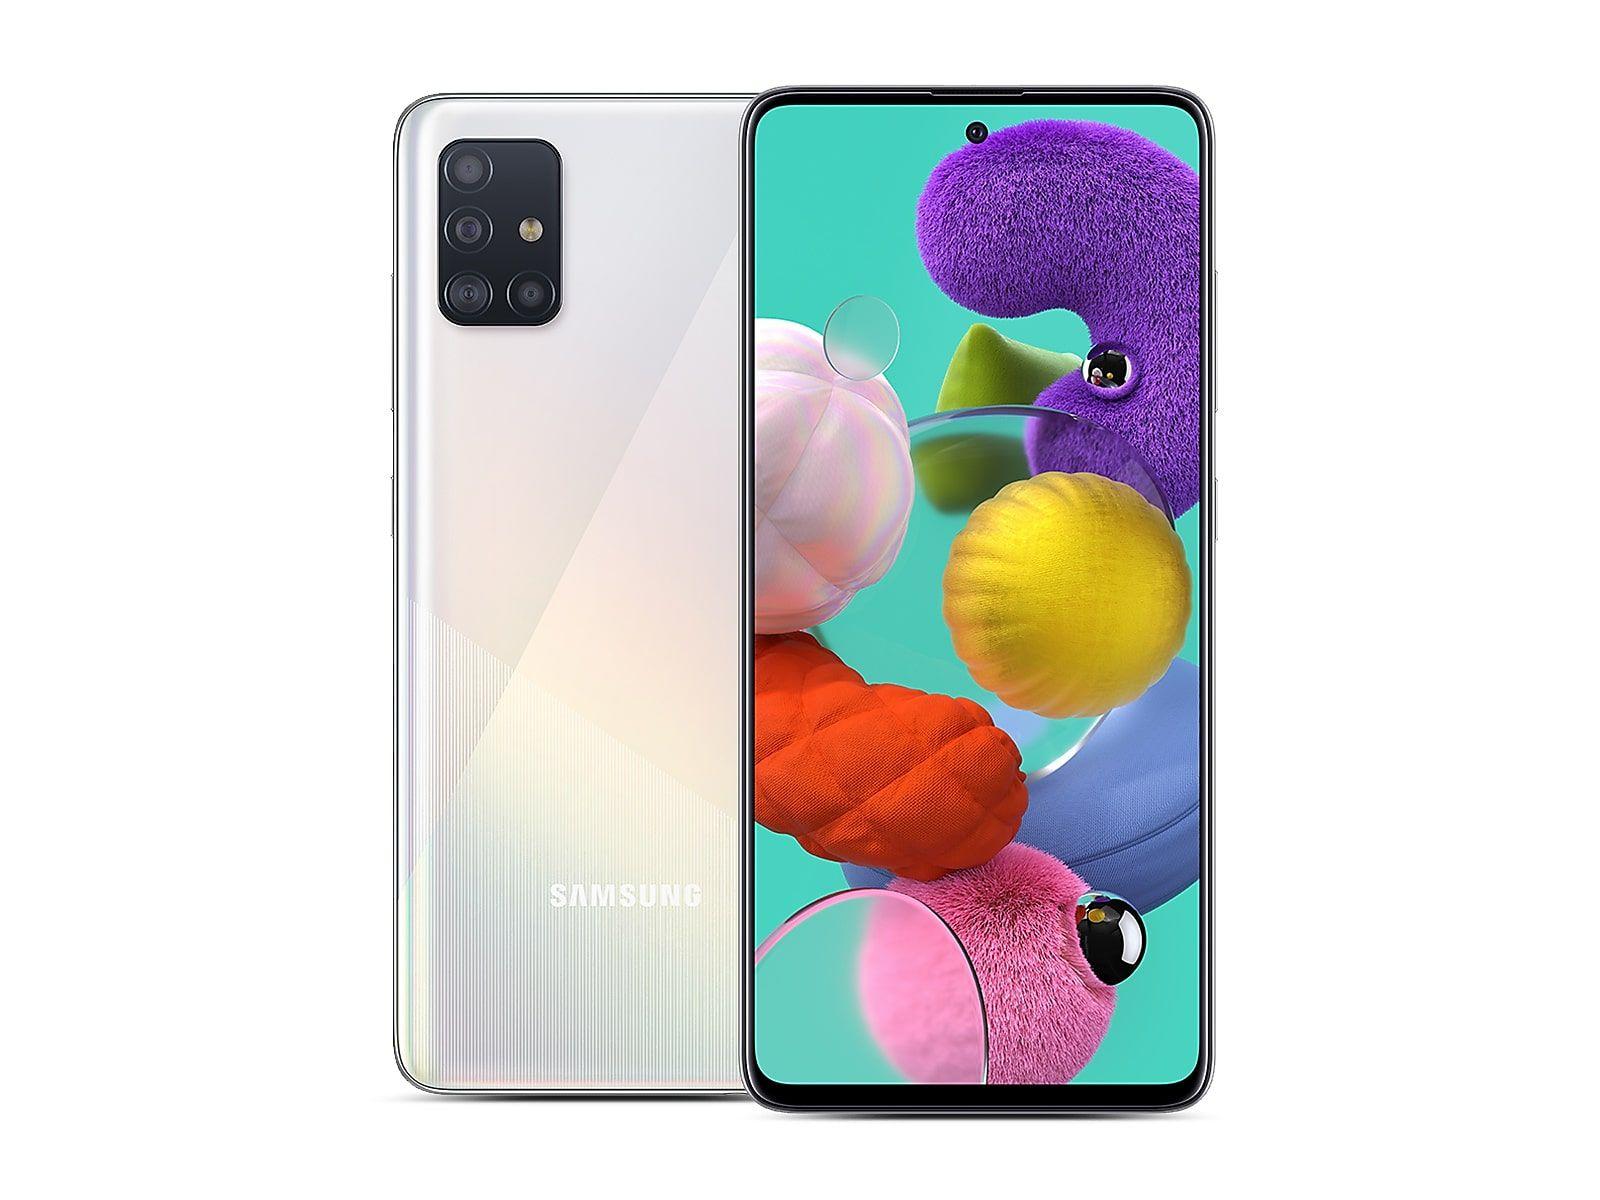 Buy The Samsung Galaxy A51 Samsung Us Samsung Galaxy Samsung Phone New Samsung Galaxy